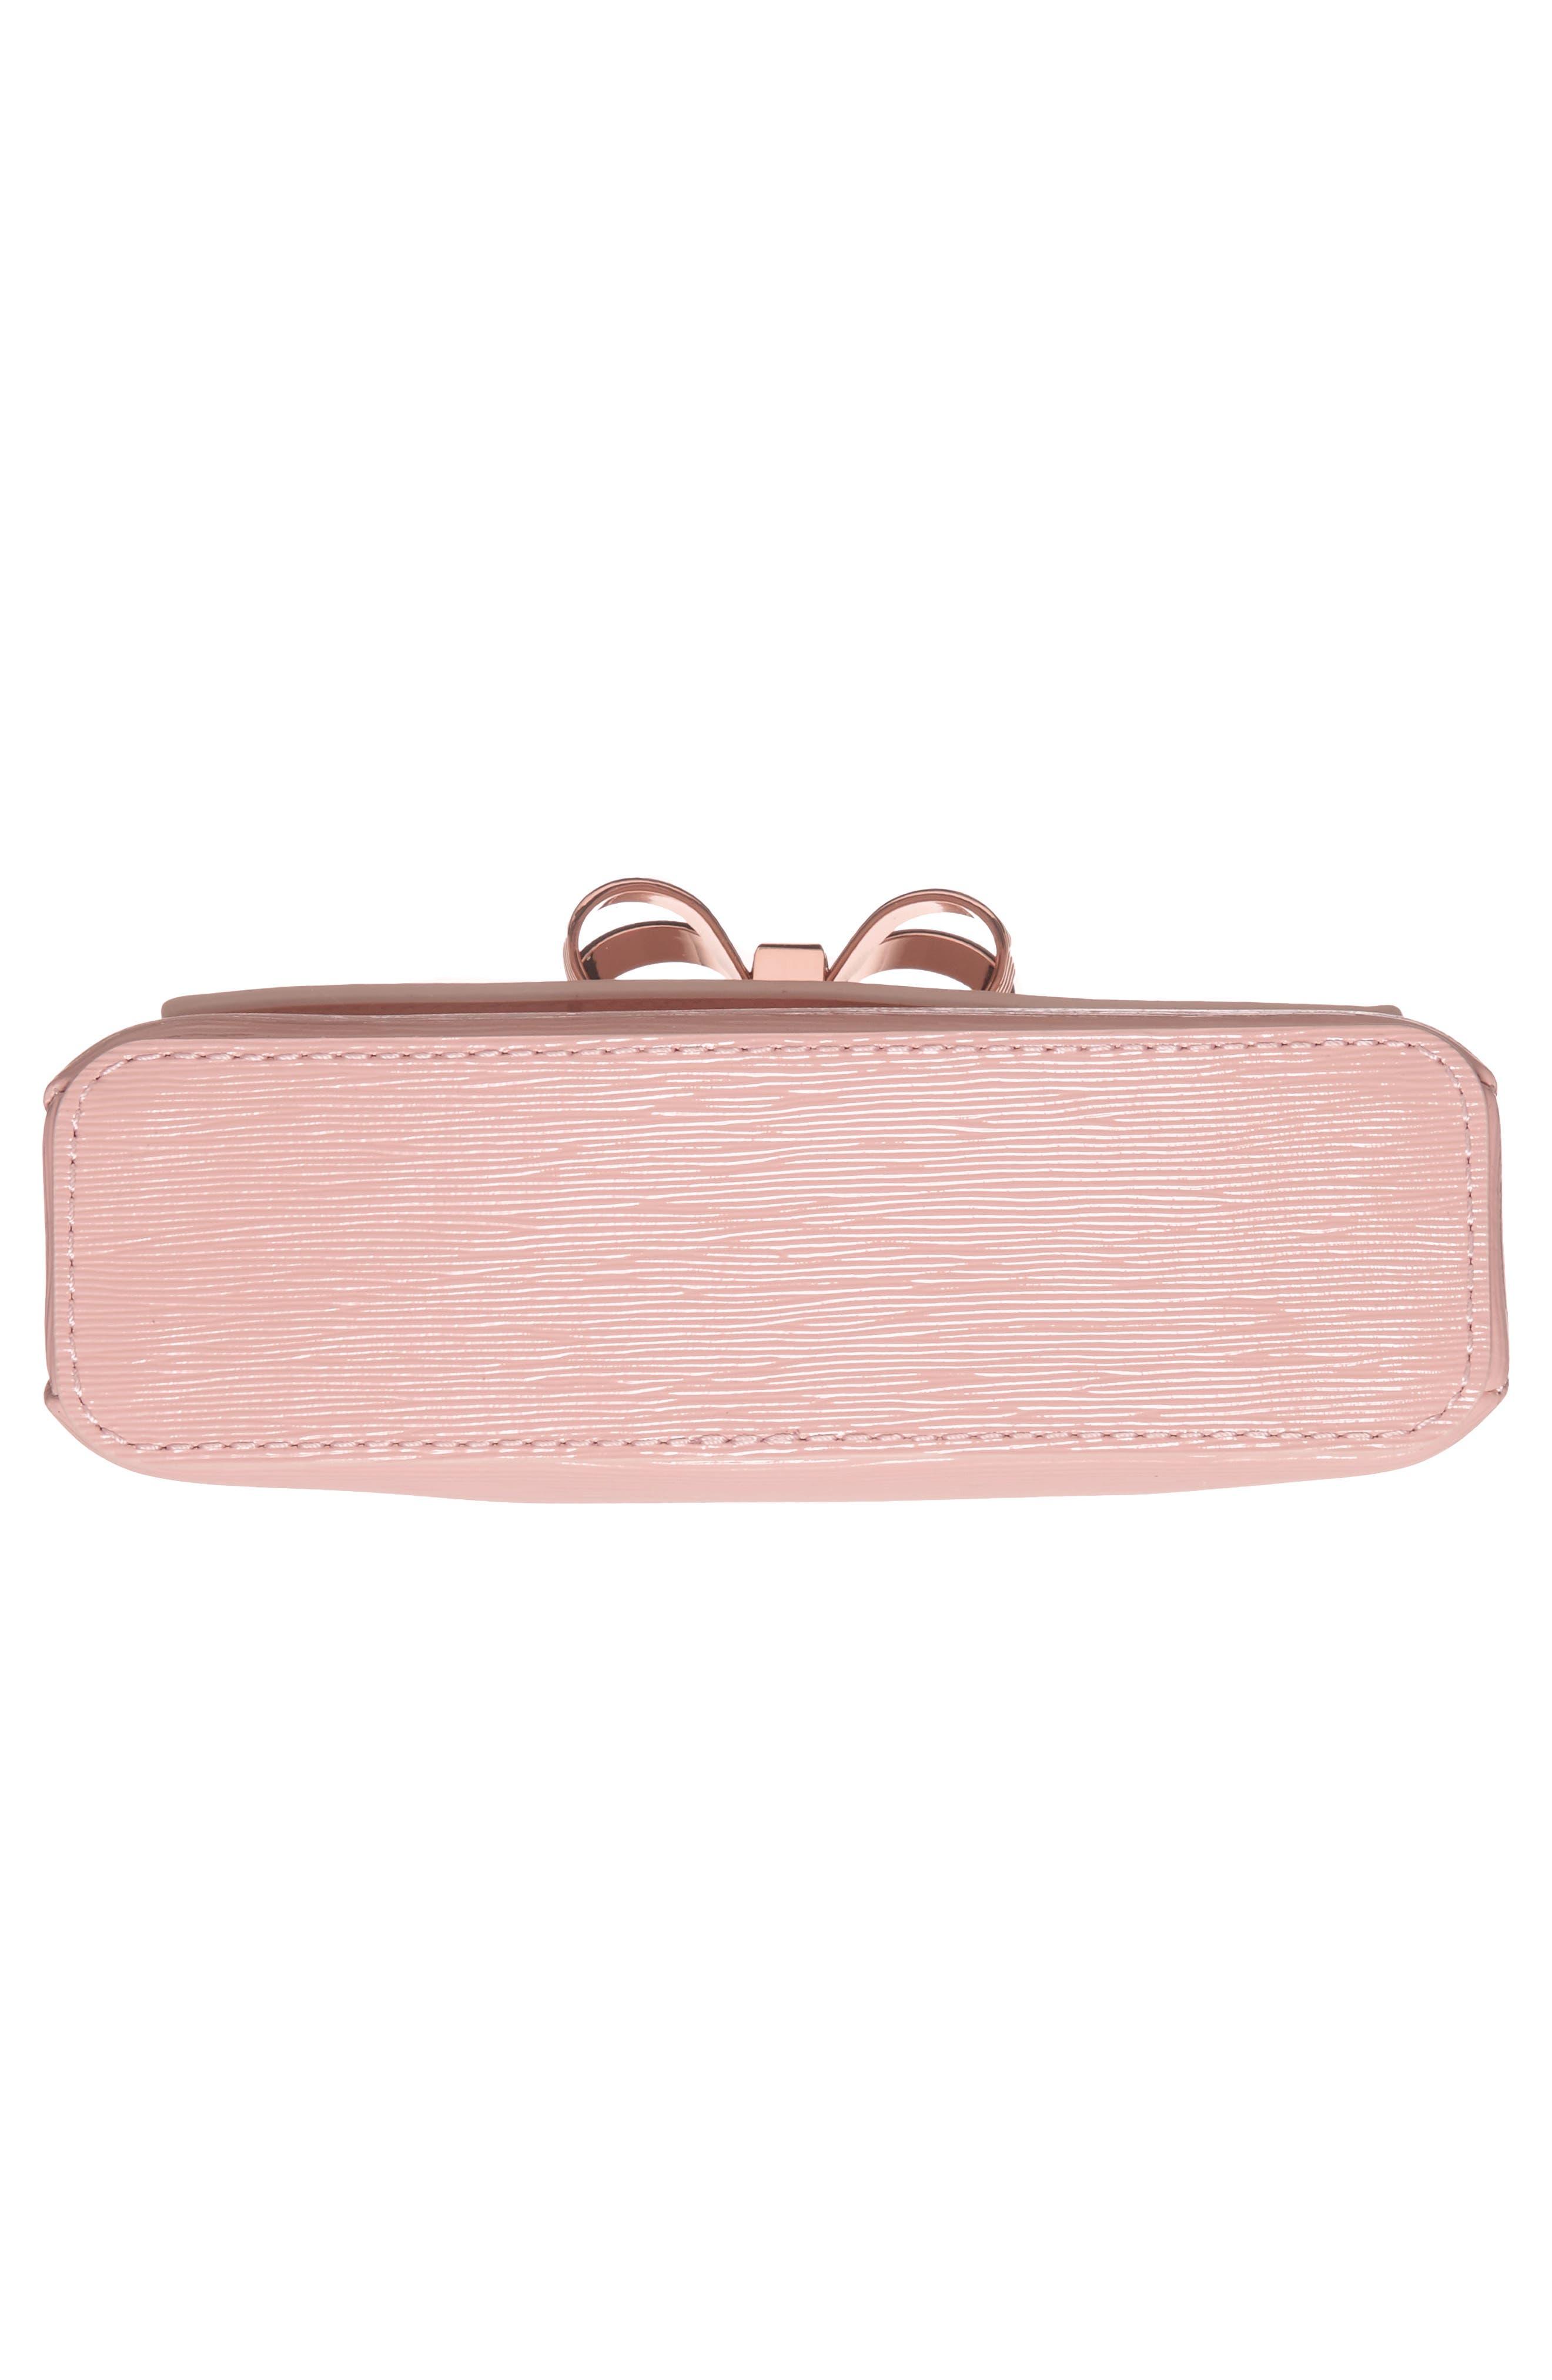 Loopa Bow Mini Leather Crossbody Bag,                             Alternate thumbnail 12, color,